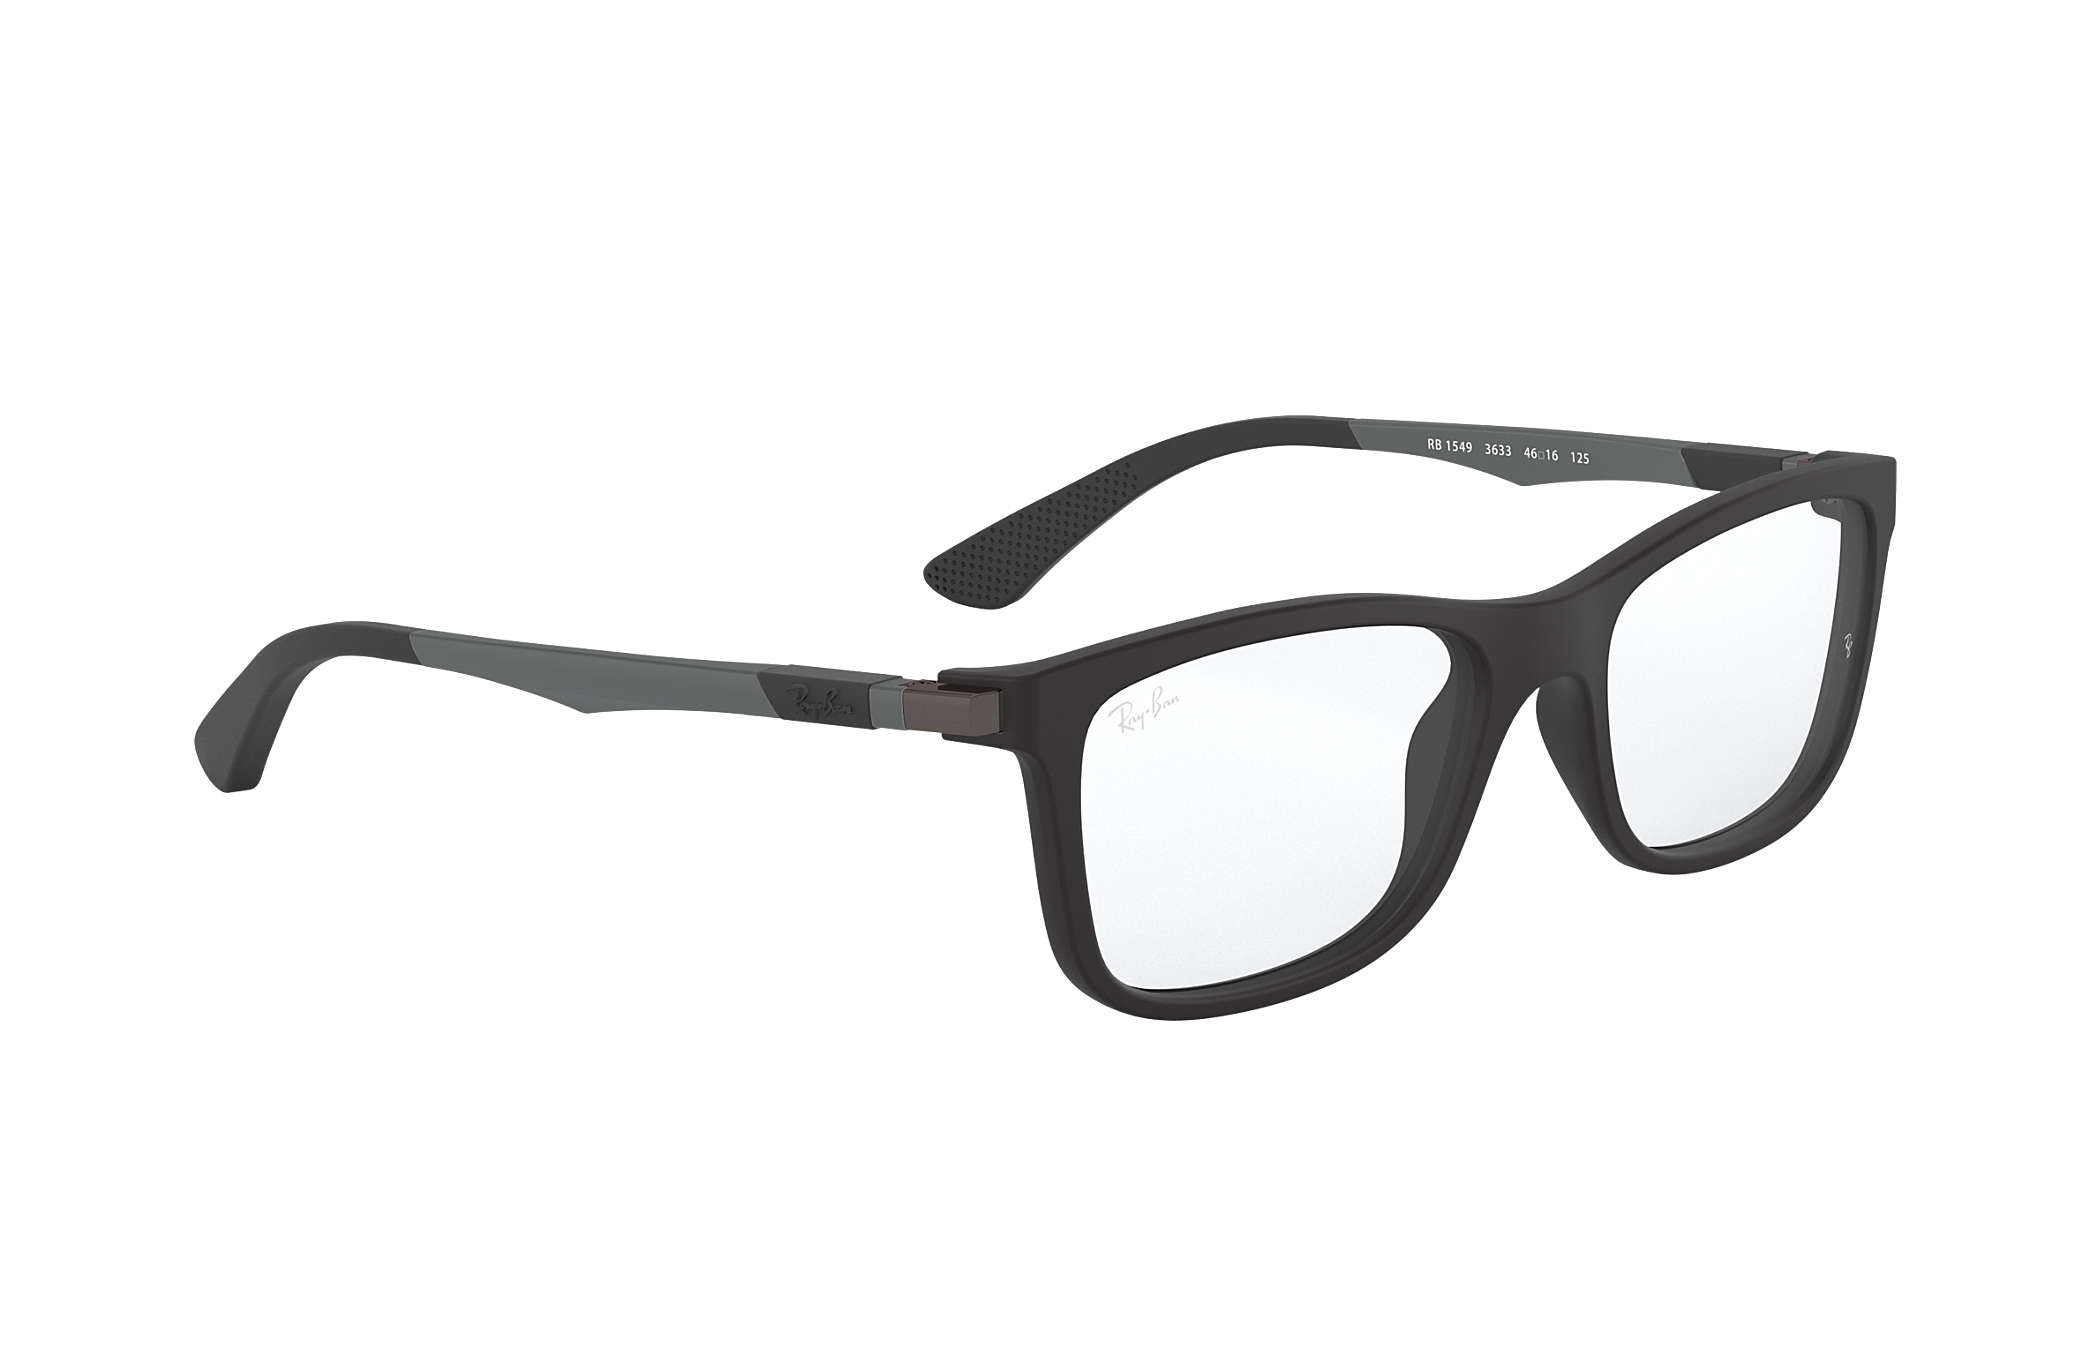 6bf7493901 Ray-Ban prescription glasses RY1549 Black - Nylon - 0RY1549363348 ...